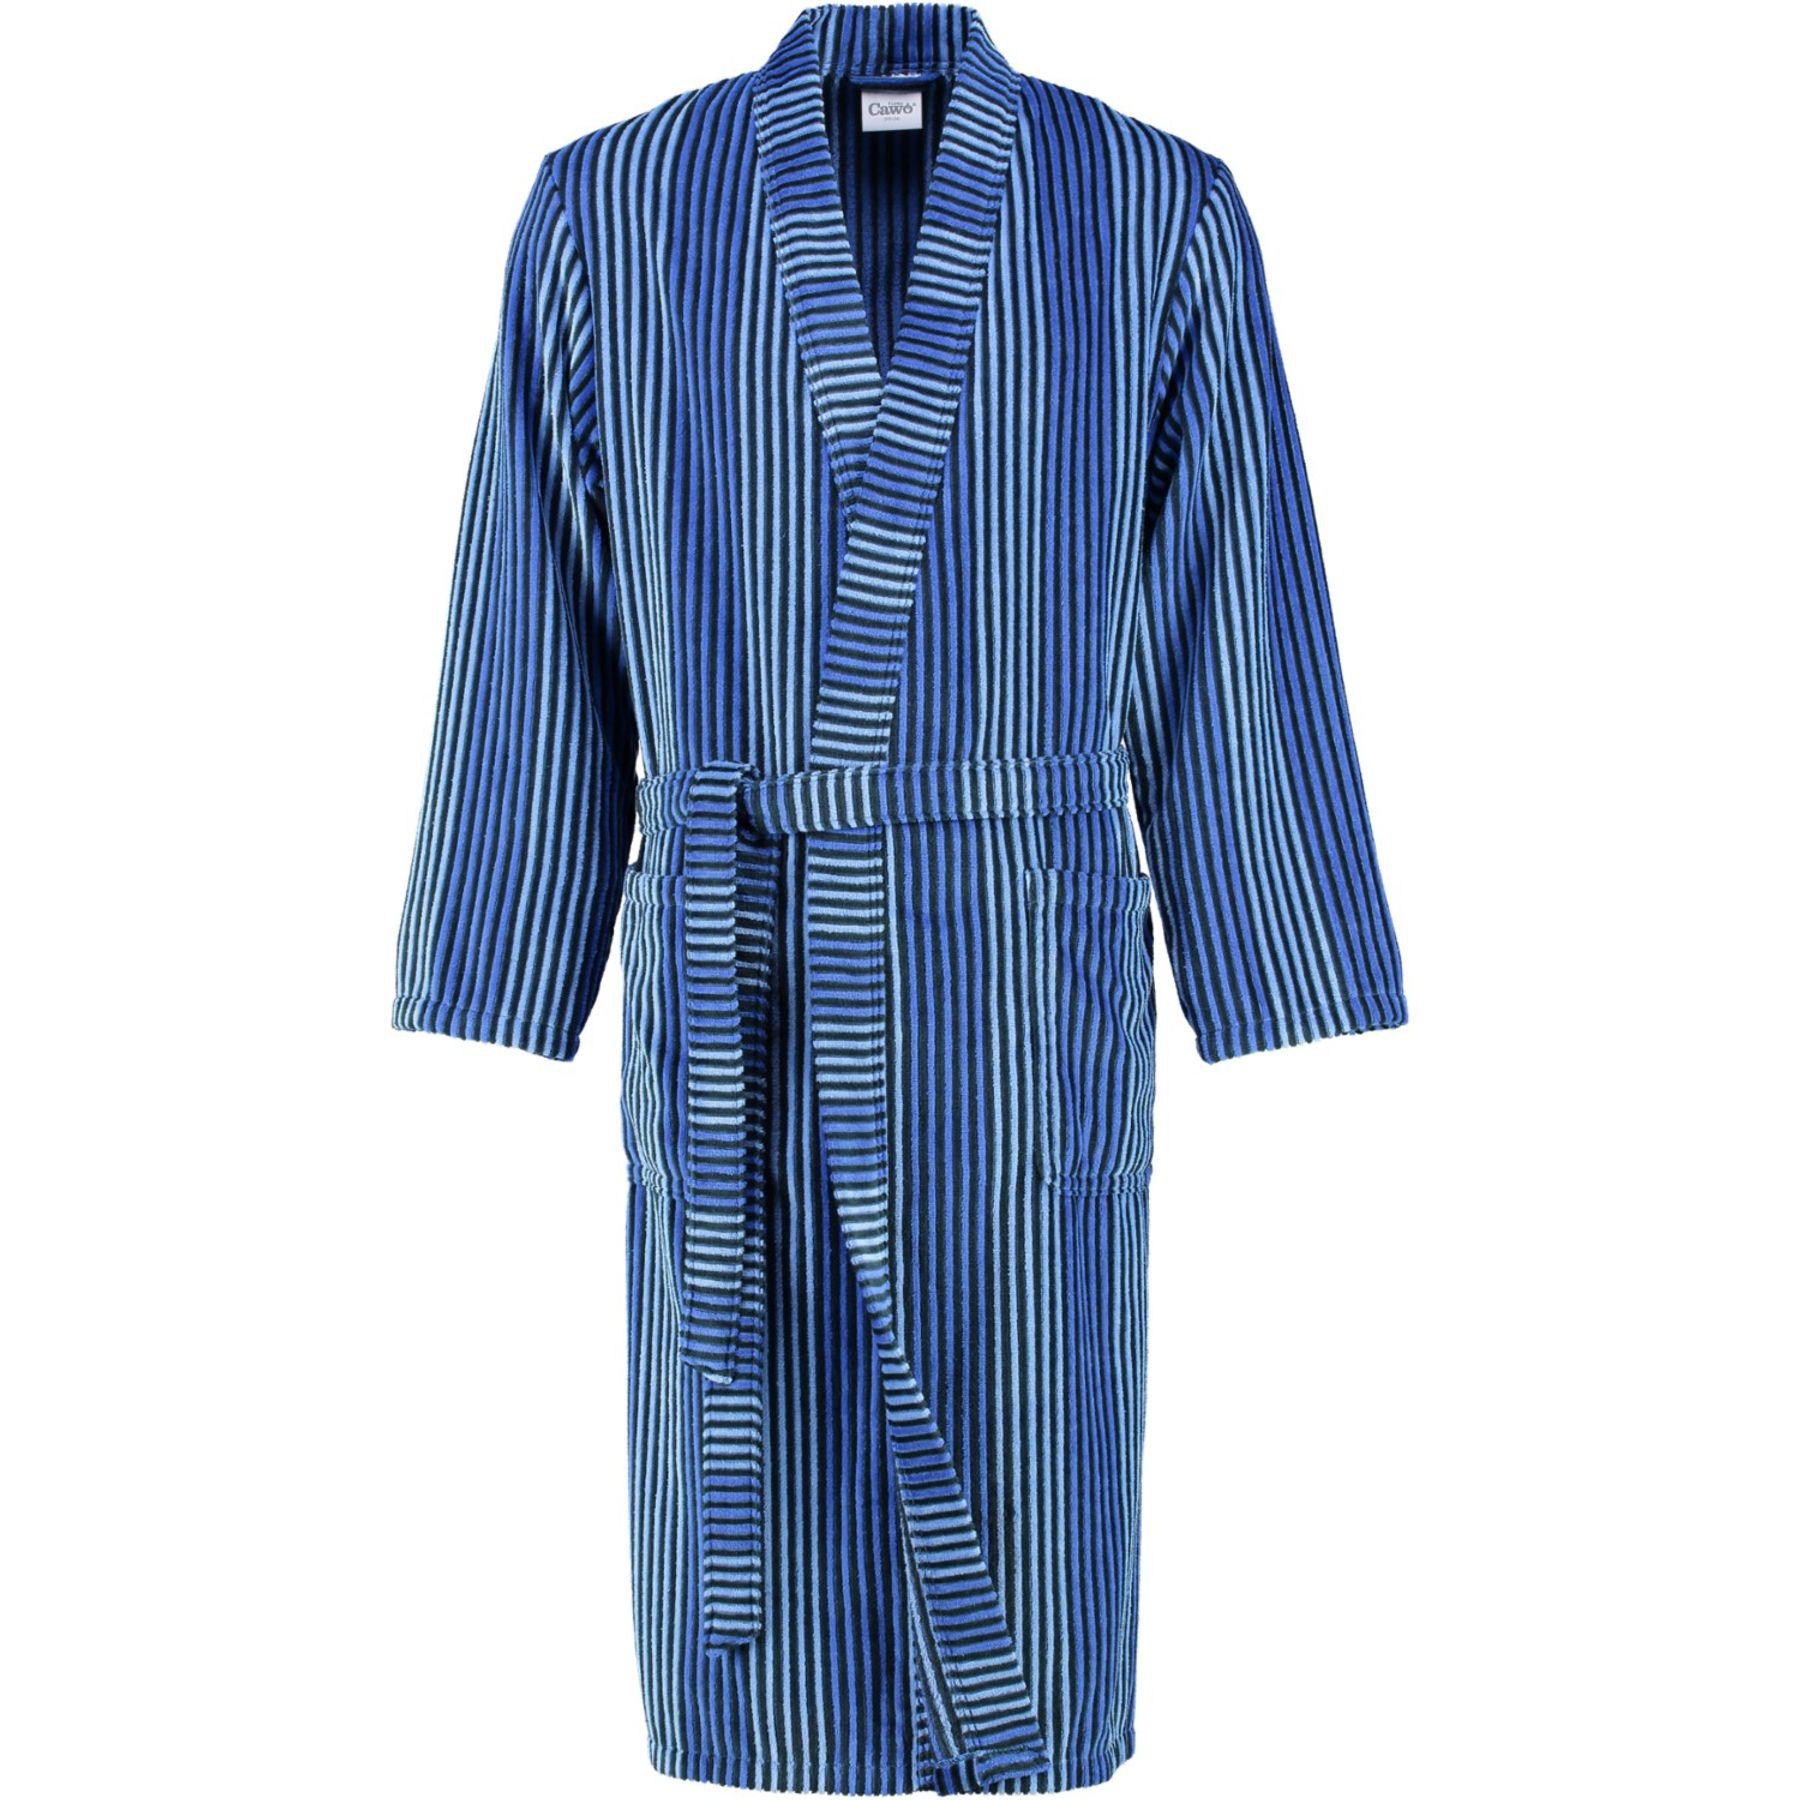 9c18d7254a81 Cawö - Extra leichter Herren Velours Bademantel Kimono in Cord-Optik, Blau  oder Anthrazit